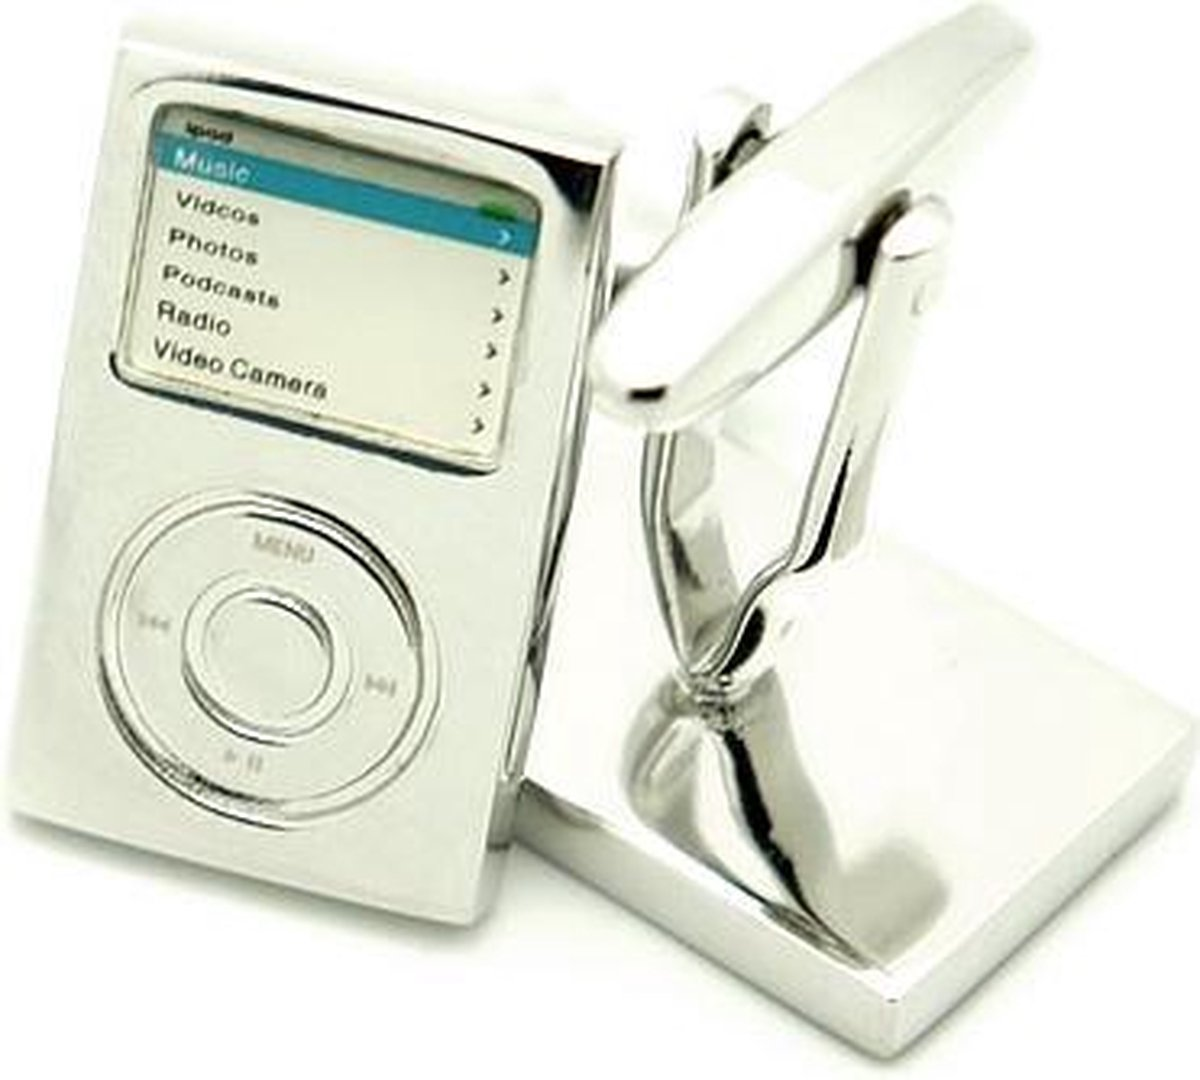 Manchetknopen - zilverkleurig - I-pod - ipod - muziek - mp3 speler iPod nano, shuffle, classic - Button Cufflinks